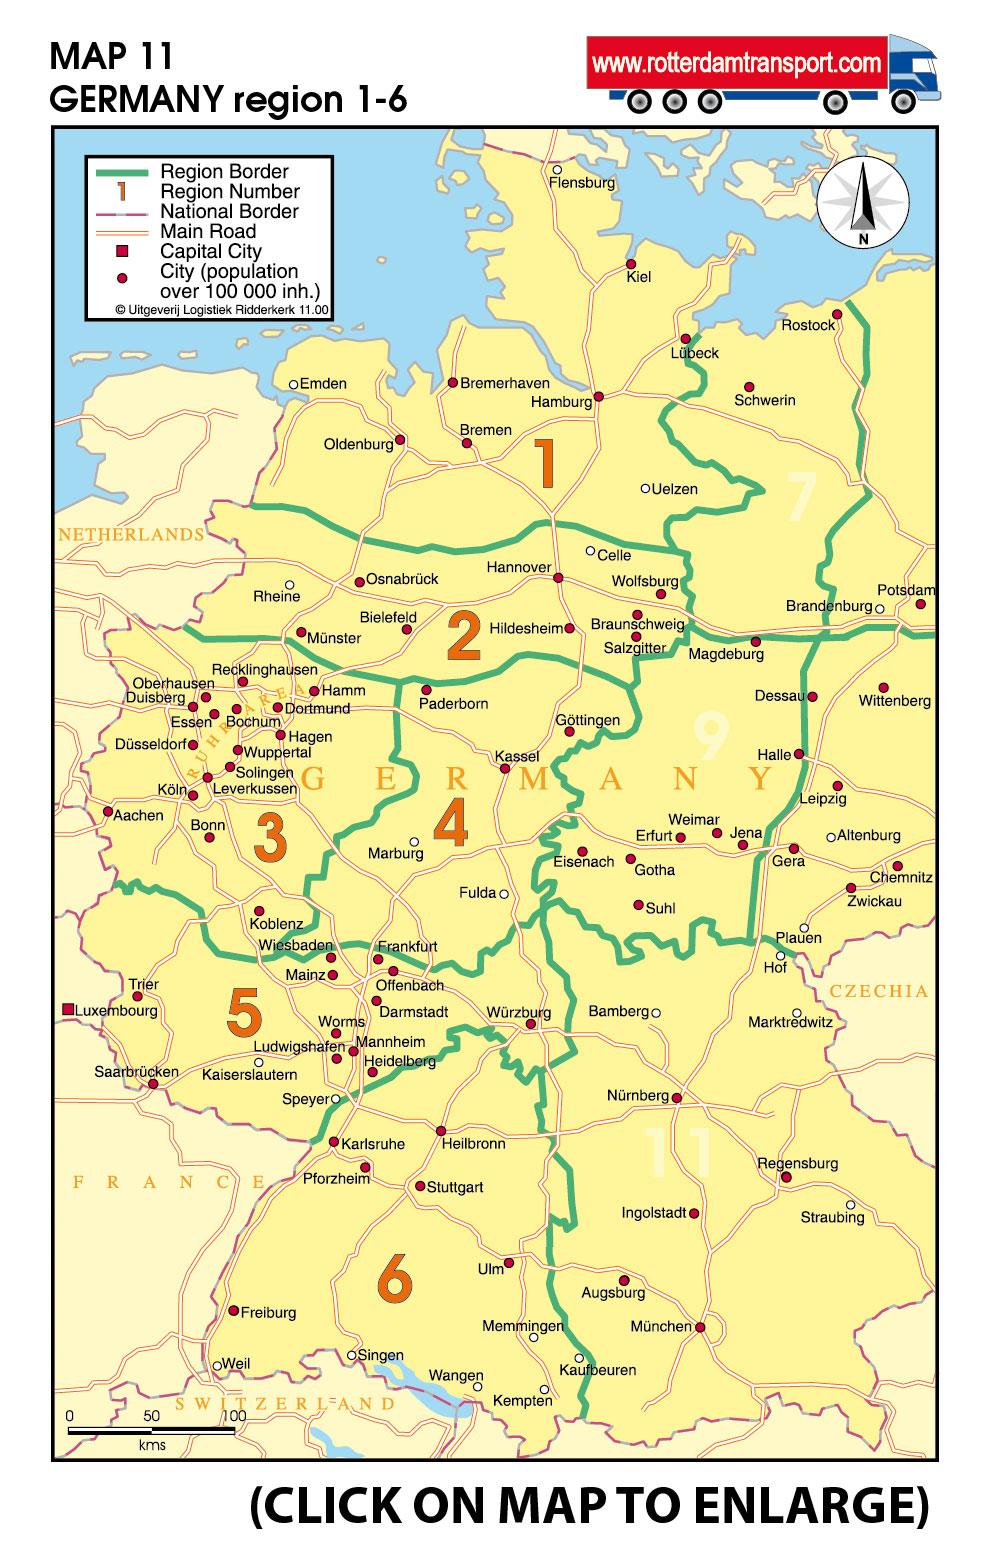 wwwrotterdamtransportcom maps groupage by road